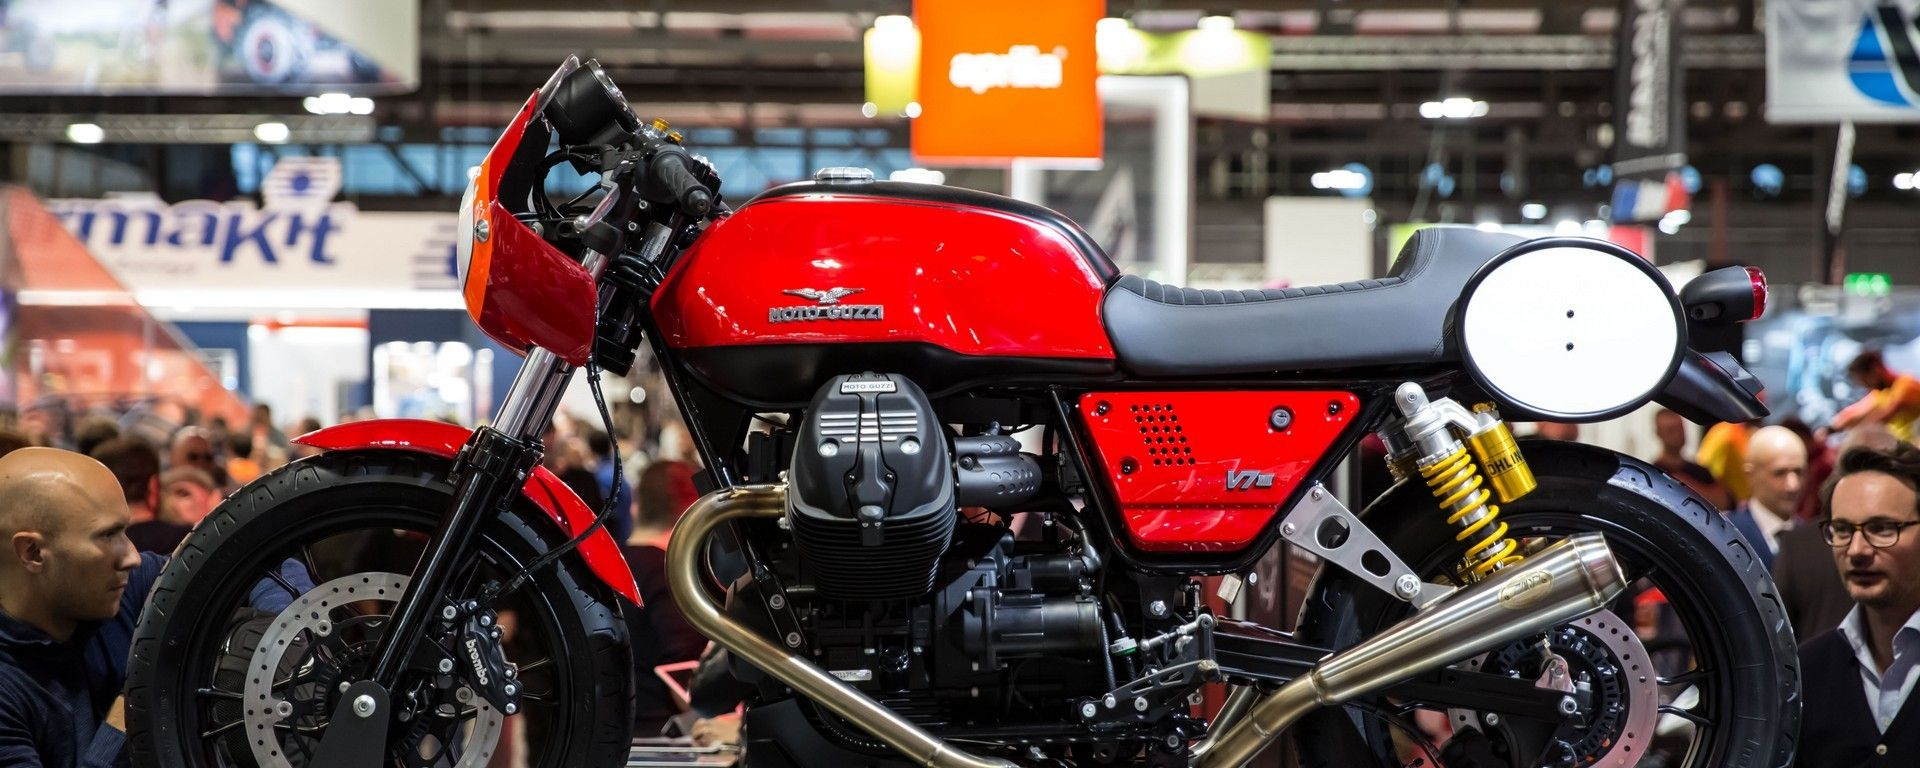 Moto Guzzi Fast Endurance: la protagonista sarà la V7